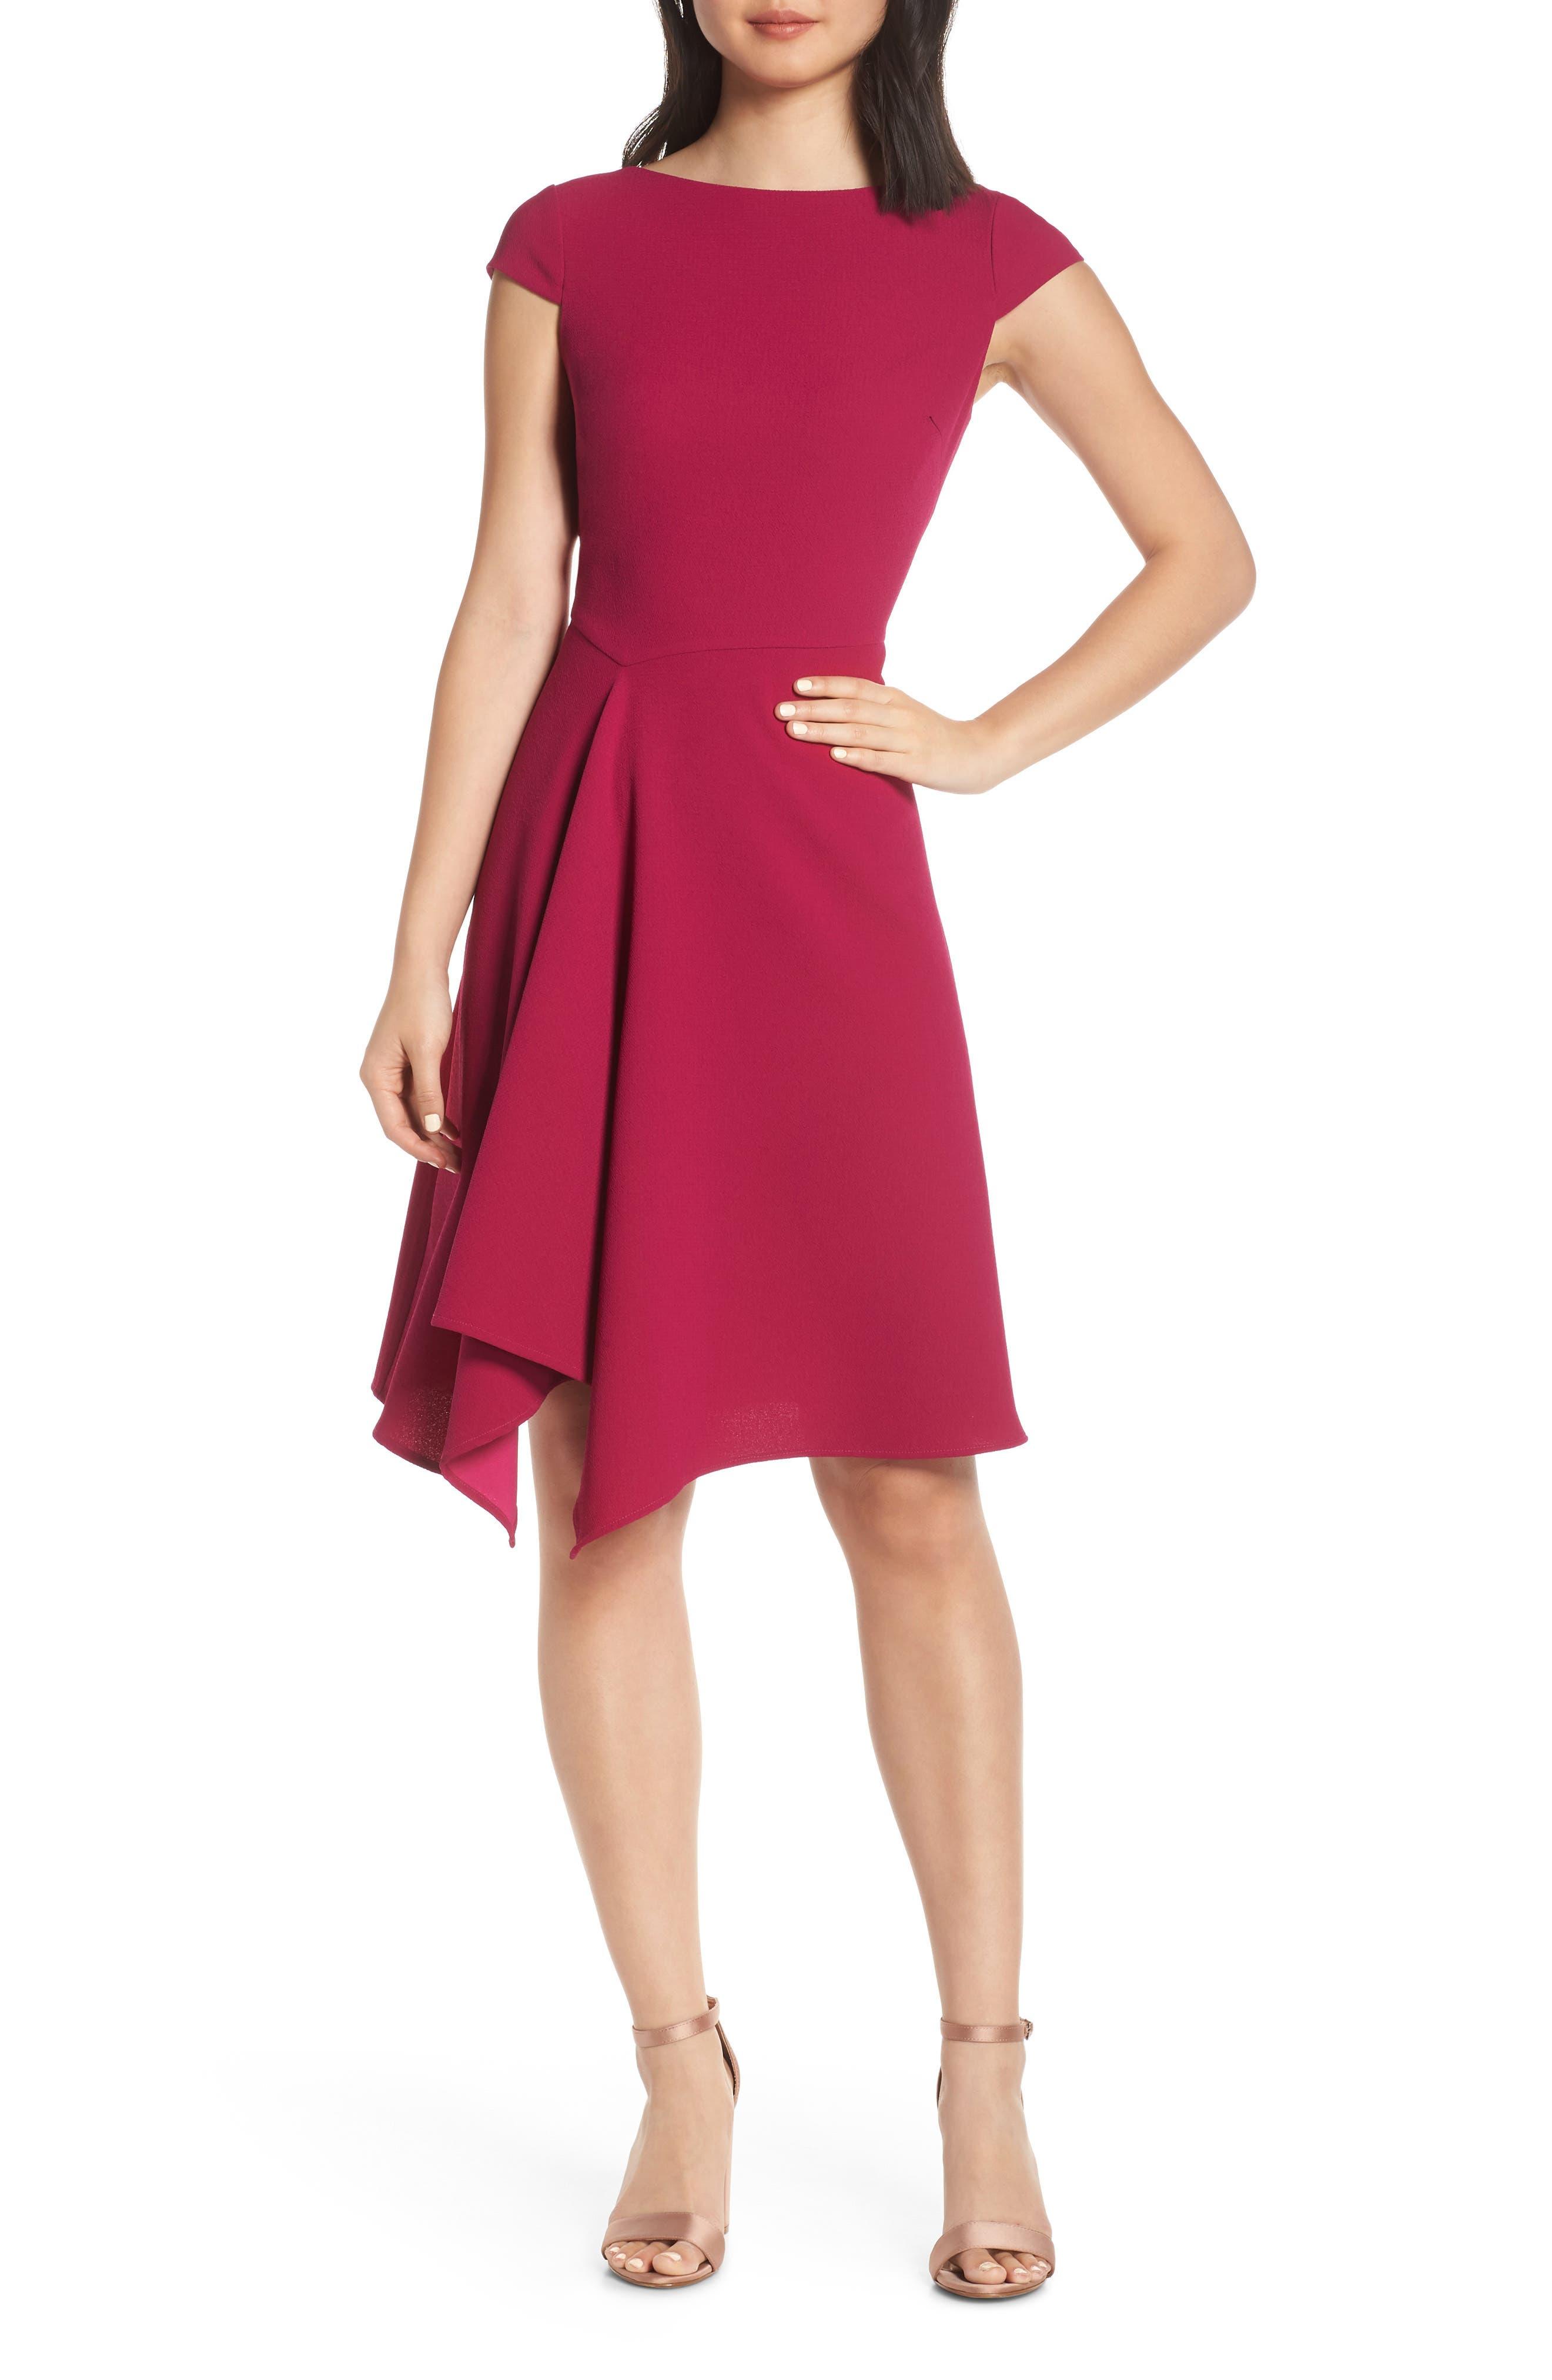 Harper Rose Dresses